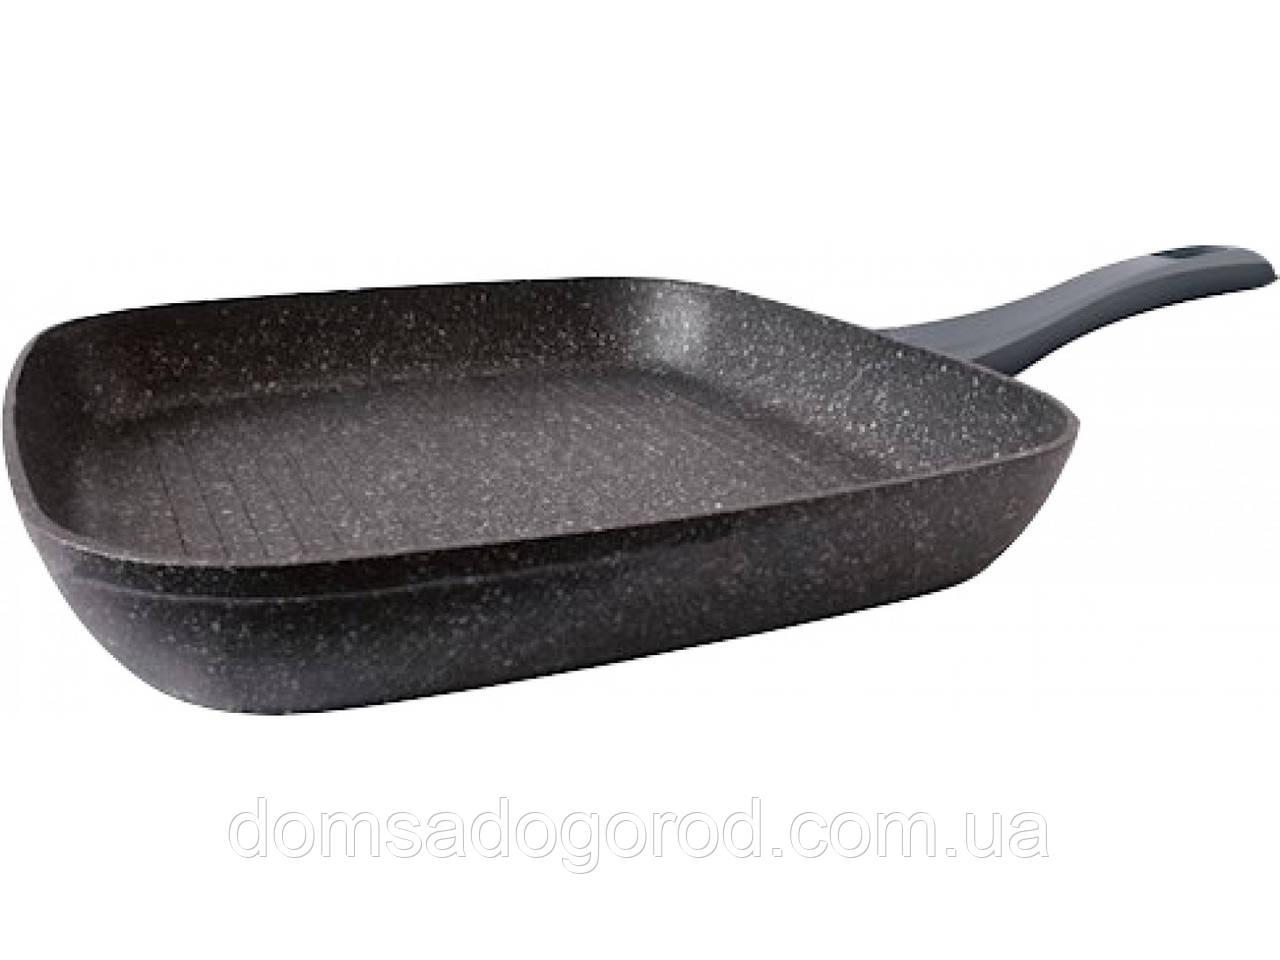 Сковорода гриль Gusto GT-2304-28 28 см